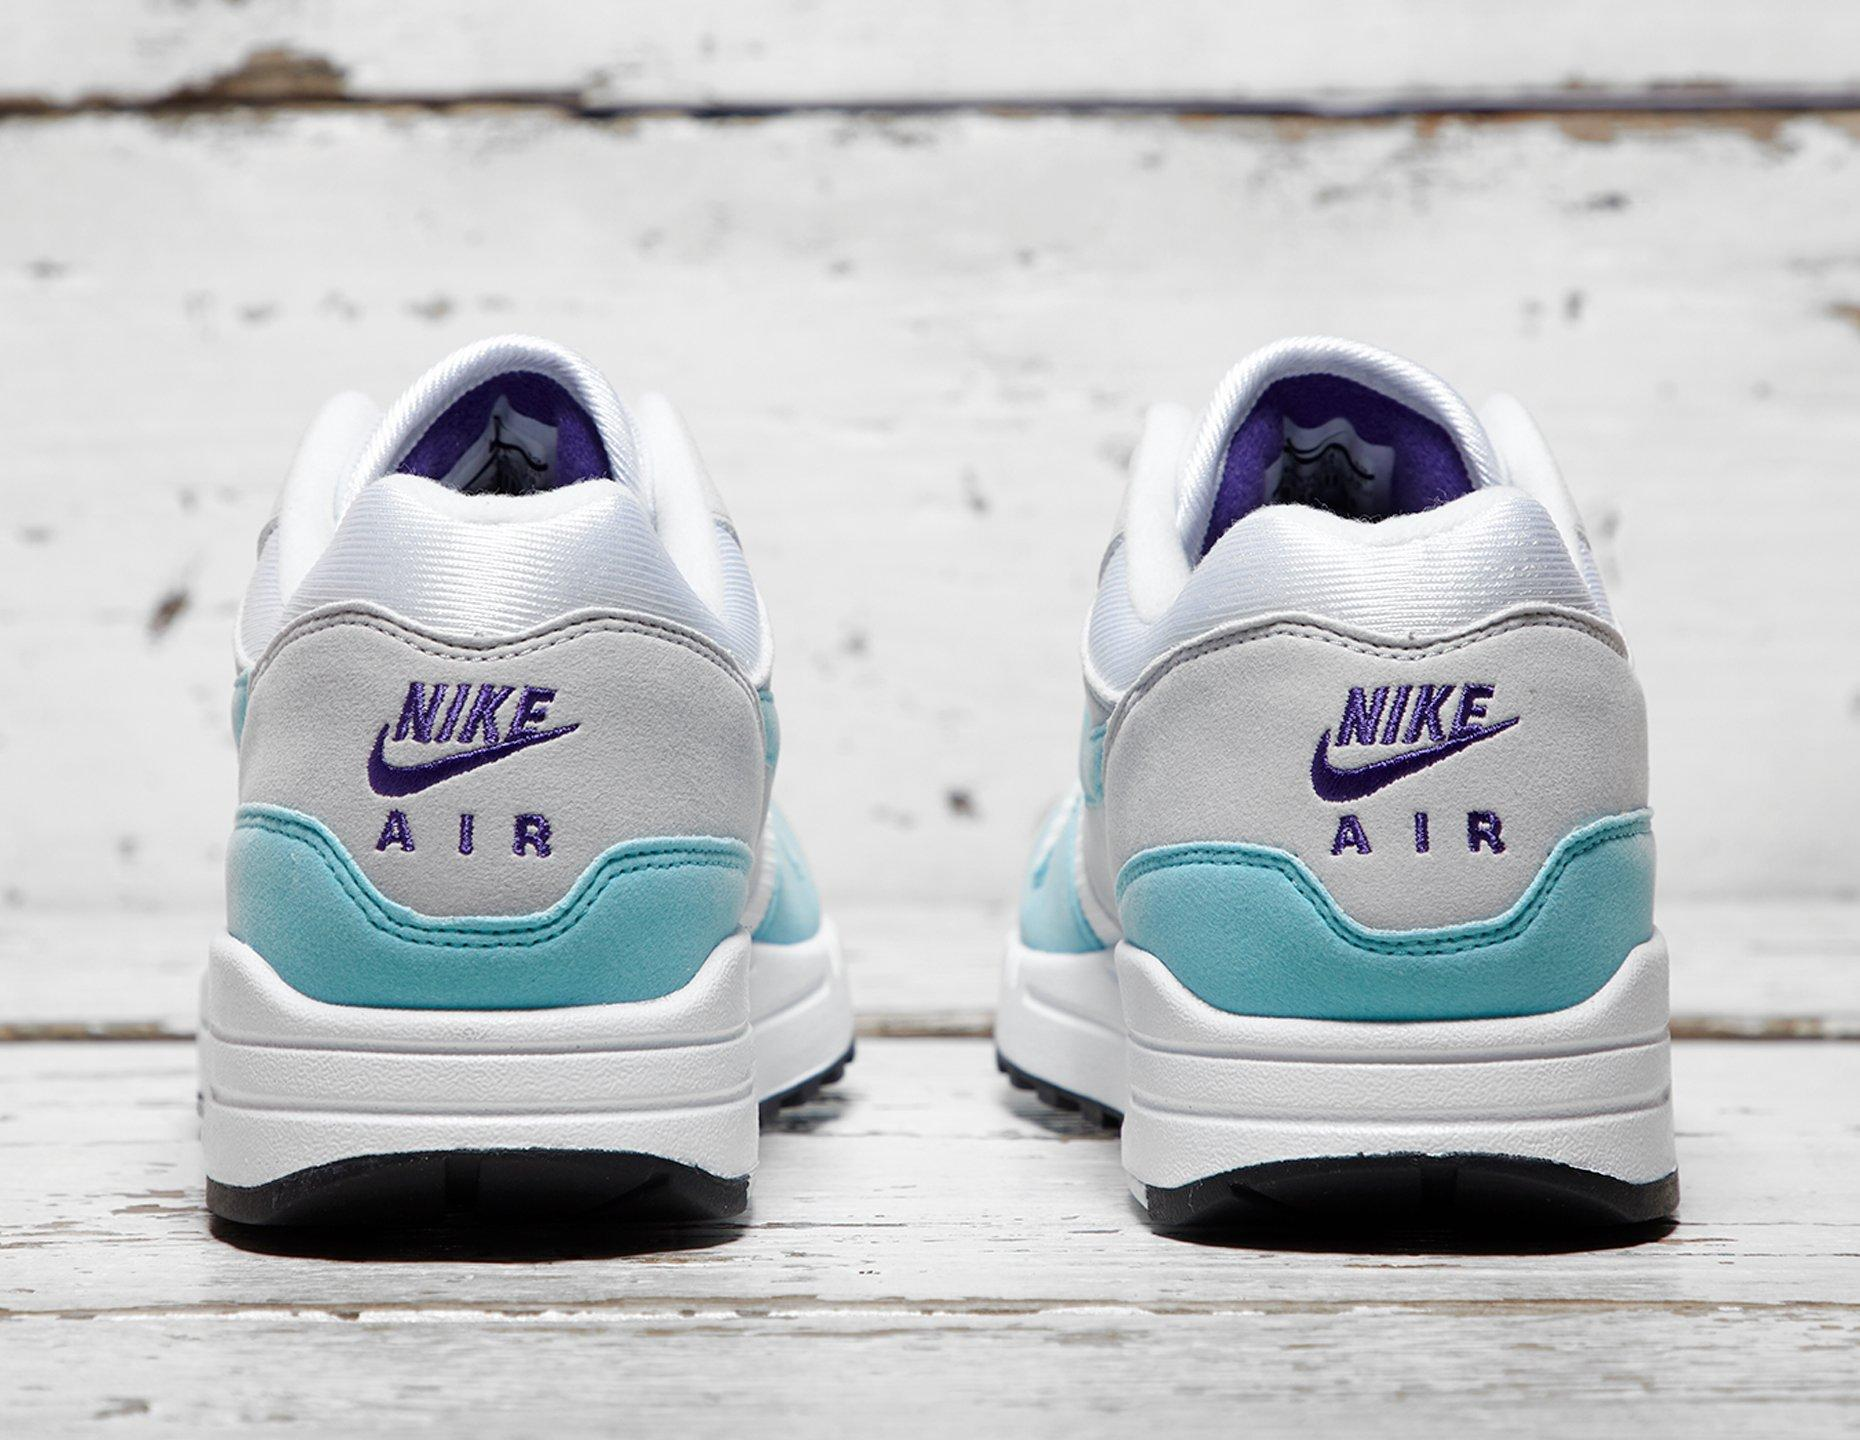 nike air max 1 anniversary aqua purple nz